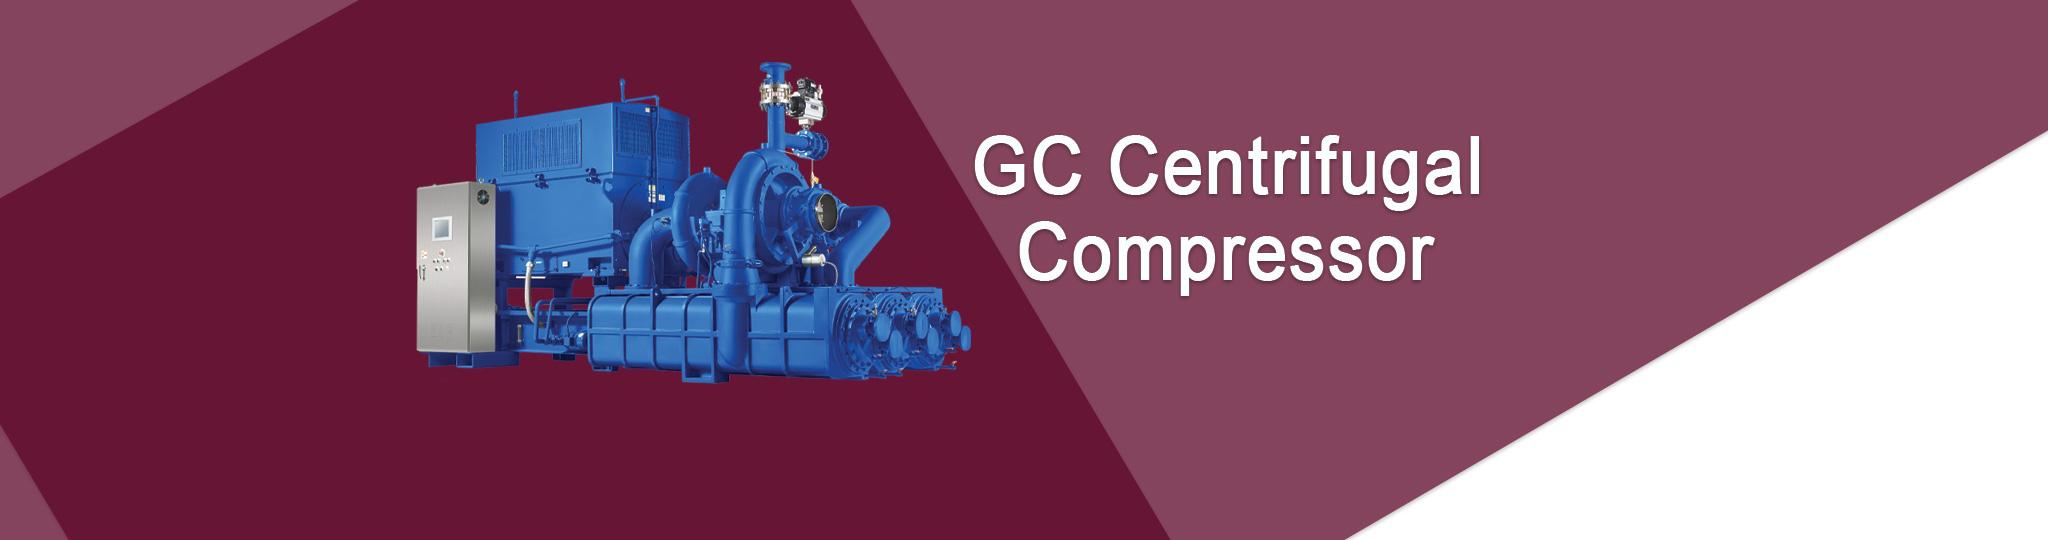 GC Centrifugal Compressor Technology header